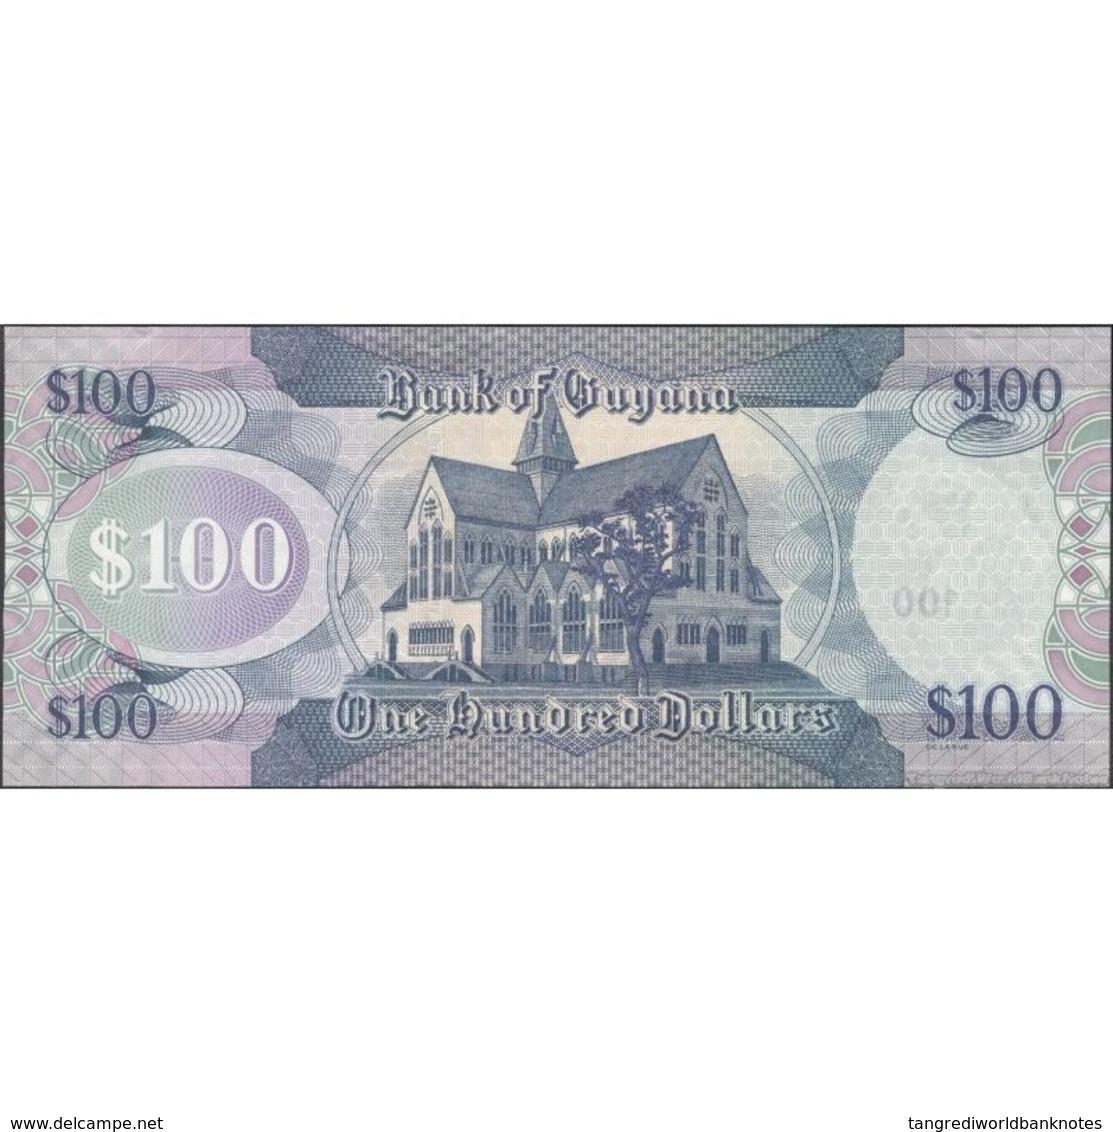 TWN - GUYANA 36b2 - 100 Dollars 2012 Prefix B/57 - Signatures: Williams & A. Singh UNC - Guyana